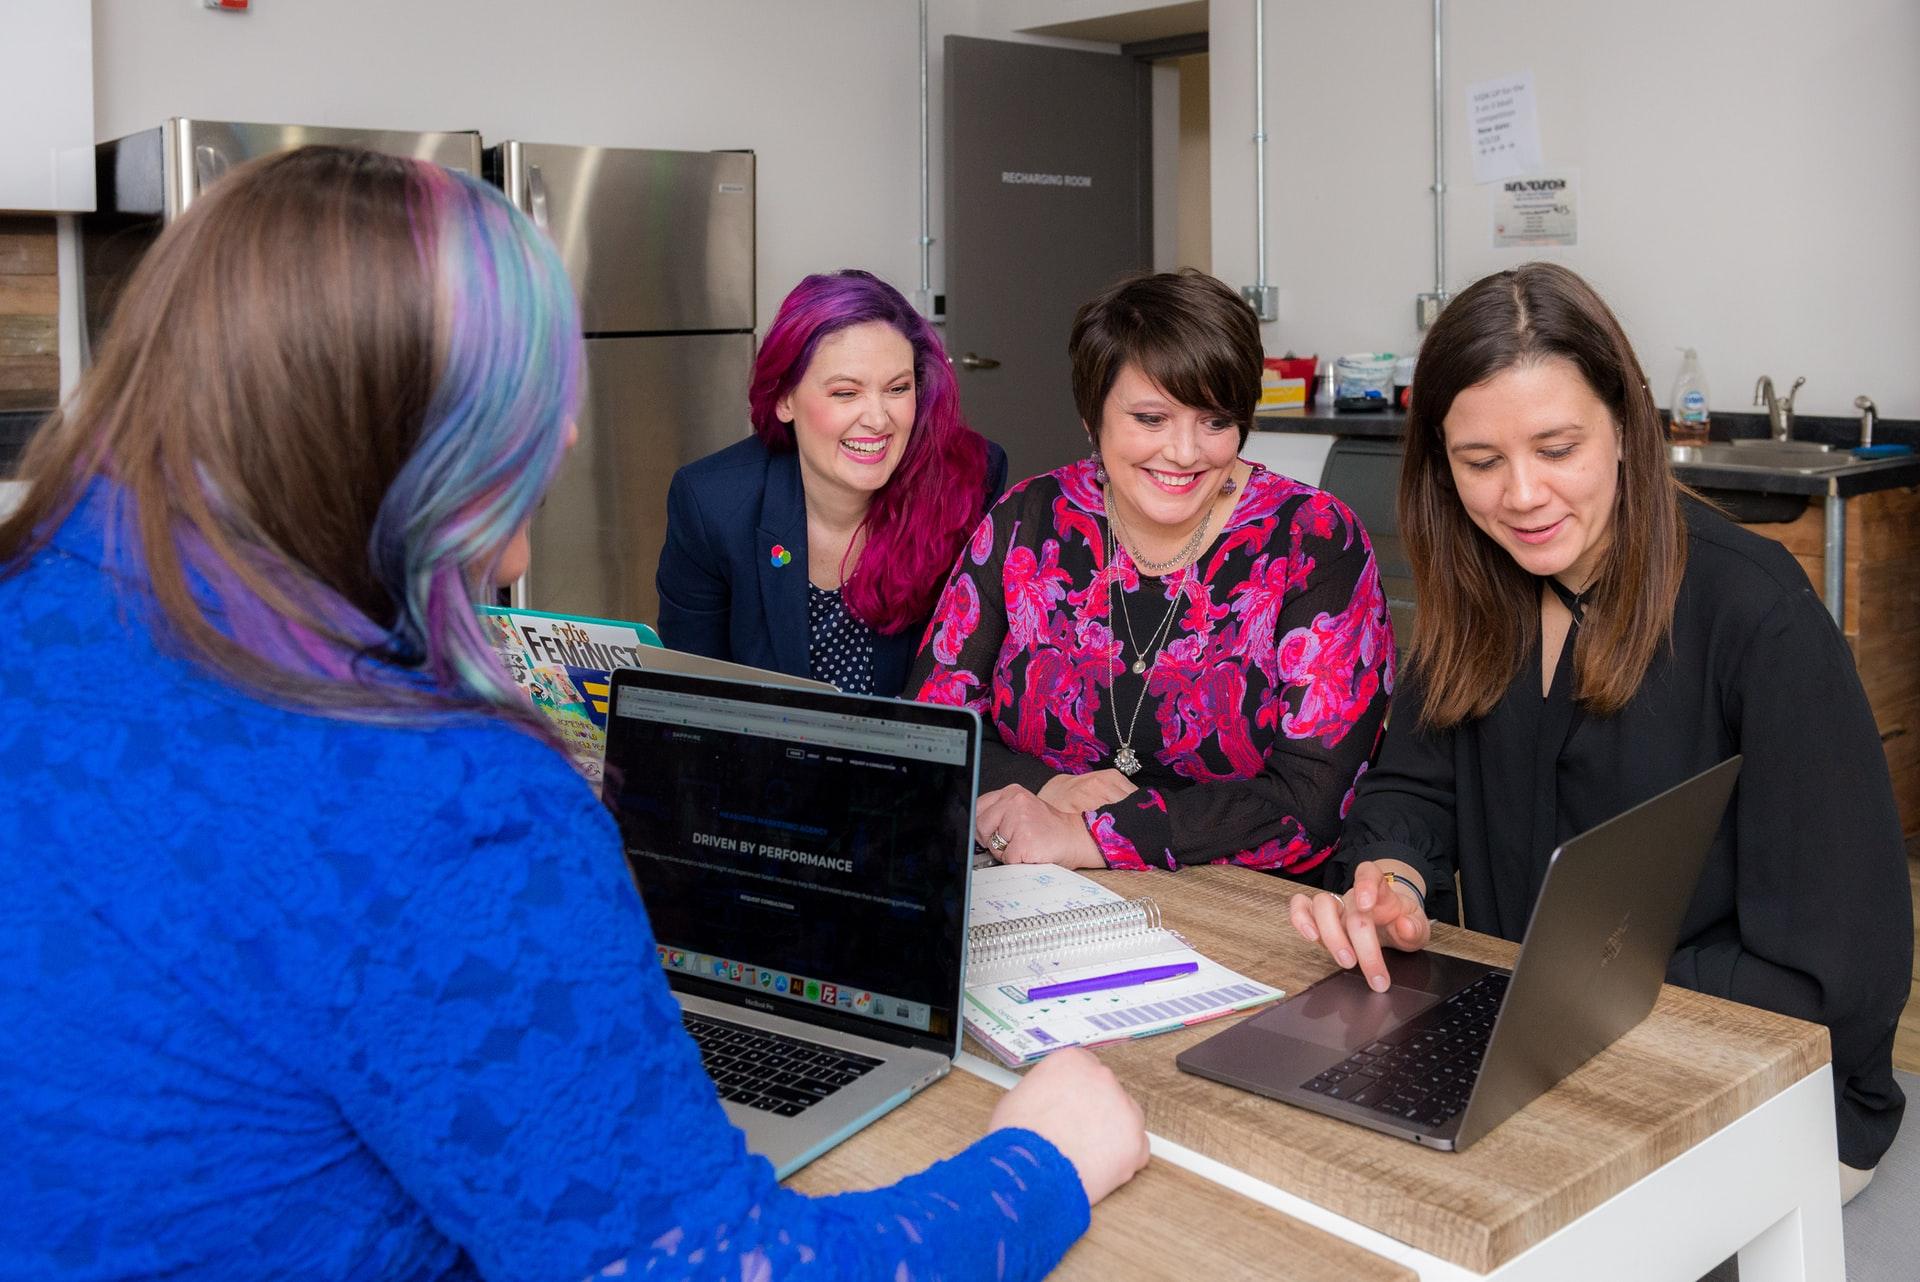 Female coworkers using a laptop. Photo by @kyliehaulk via Unsplash